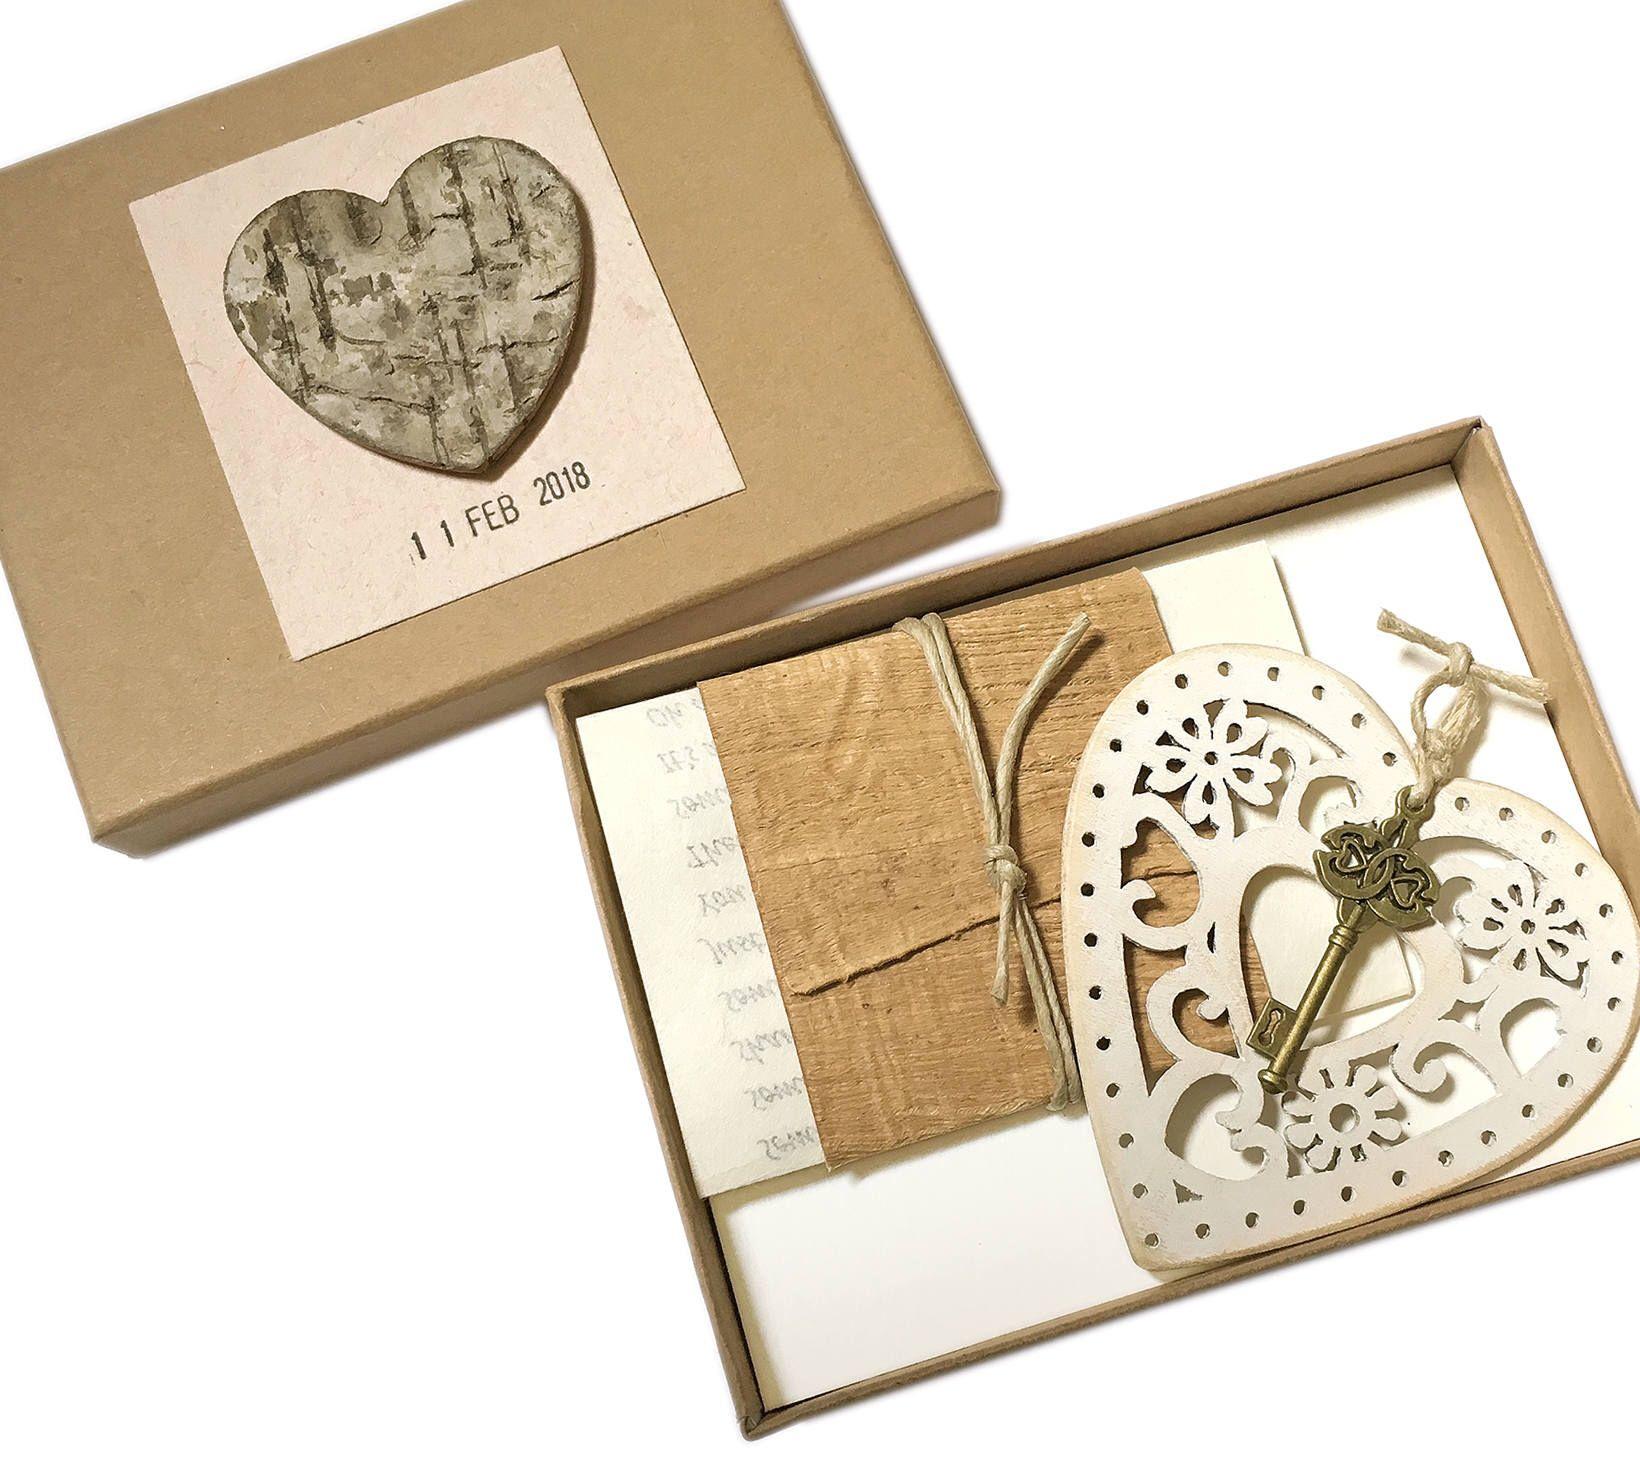 Wood anniversary gift for wife, 5 year wedding anniversary